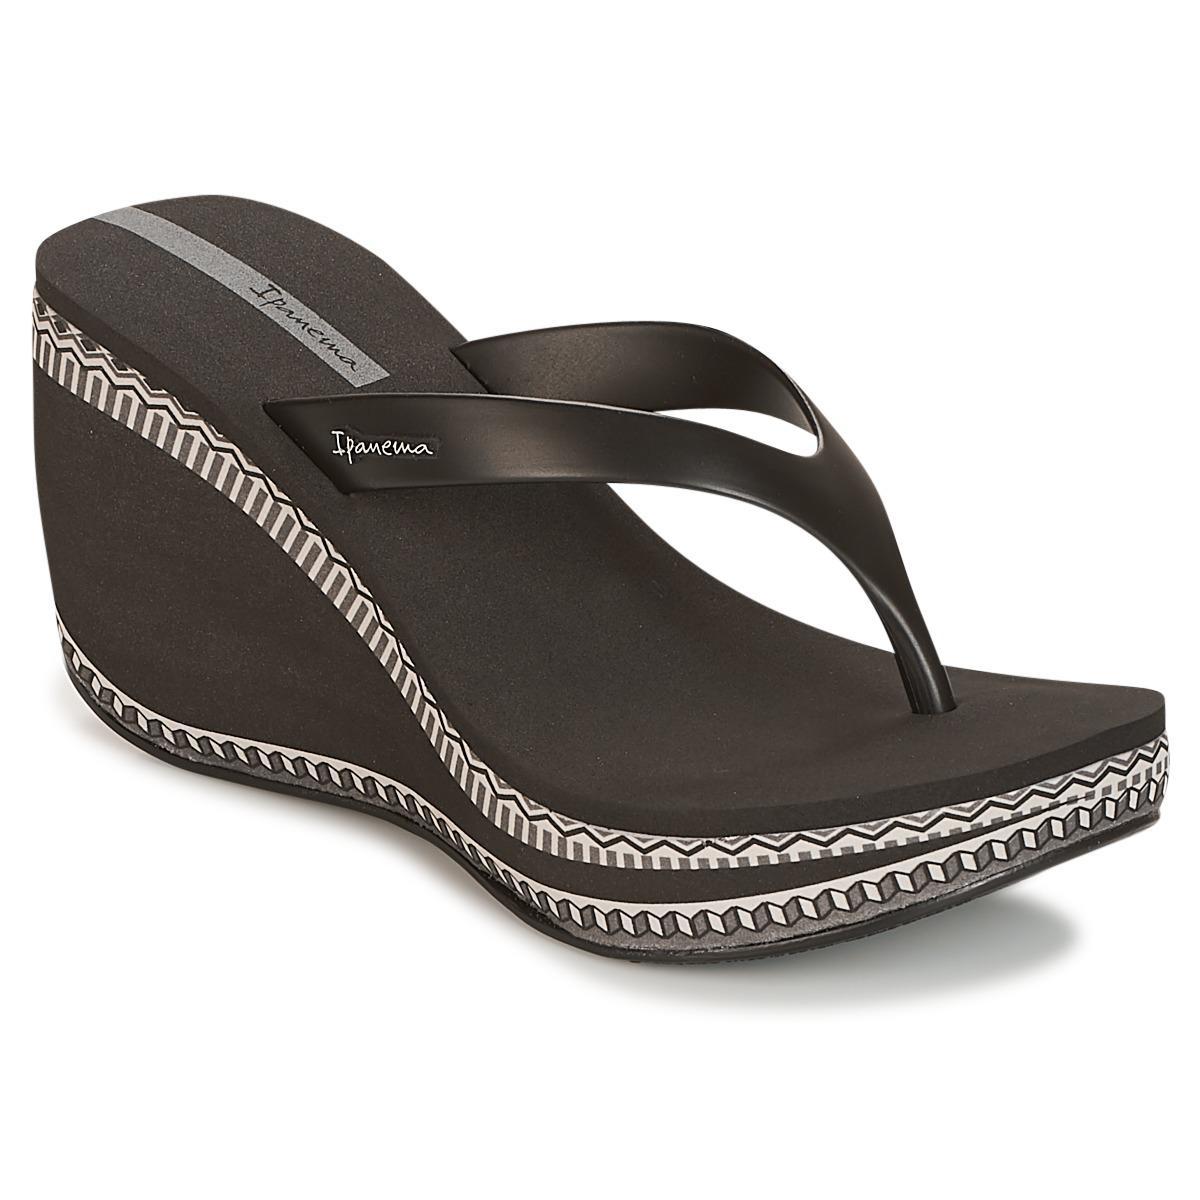 672605685 Ipanema Lipstick Thong Vi Flip Flops   Sandals (shoes) in Black - Lyst